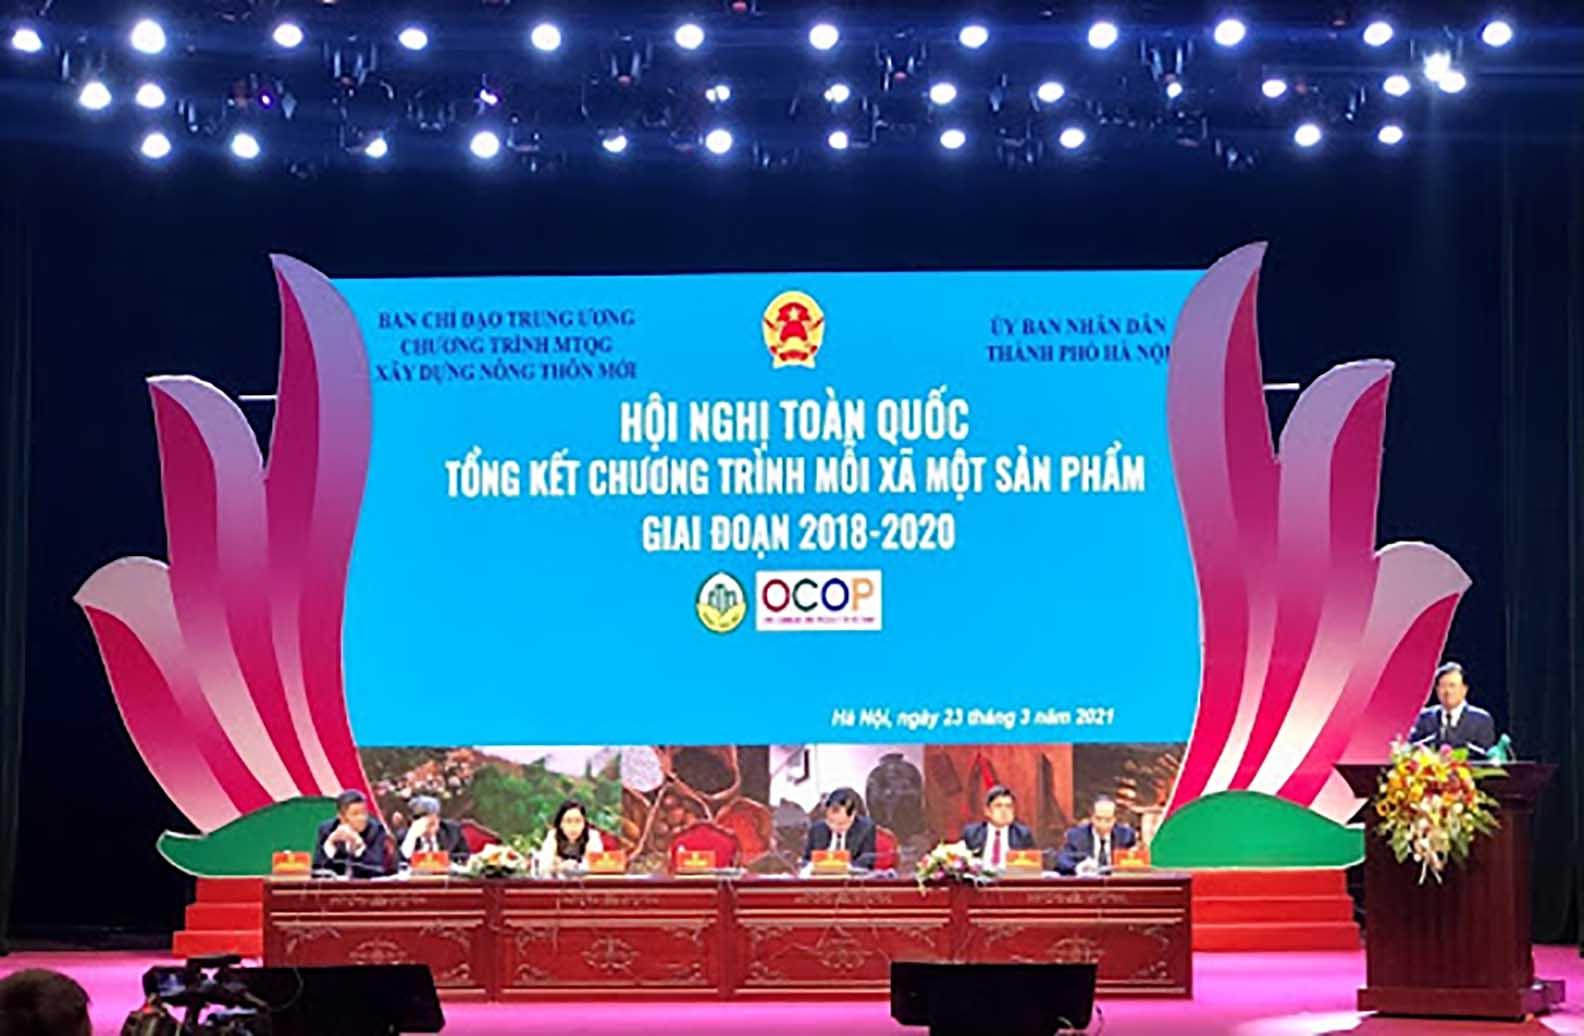 Initial impressions of OCOP 2018-2010 program